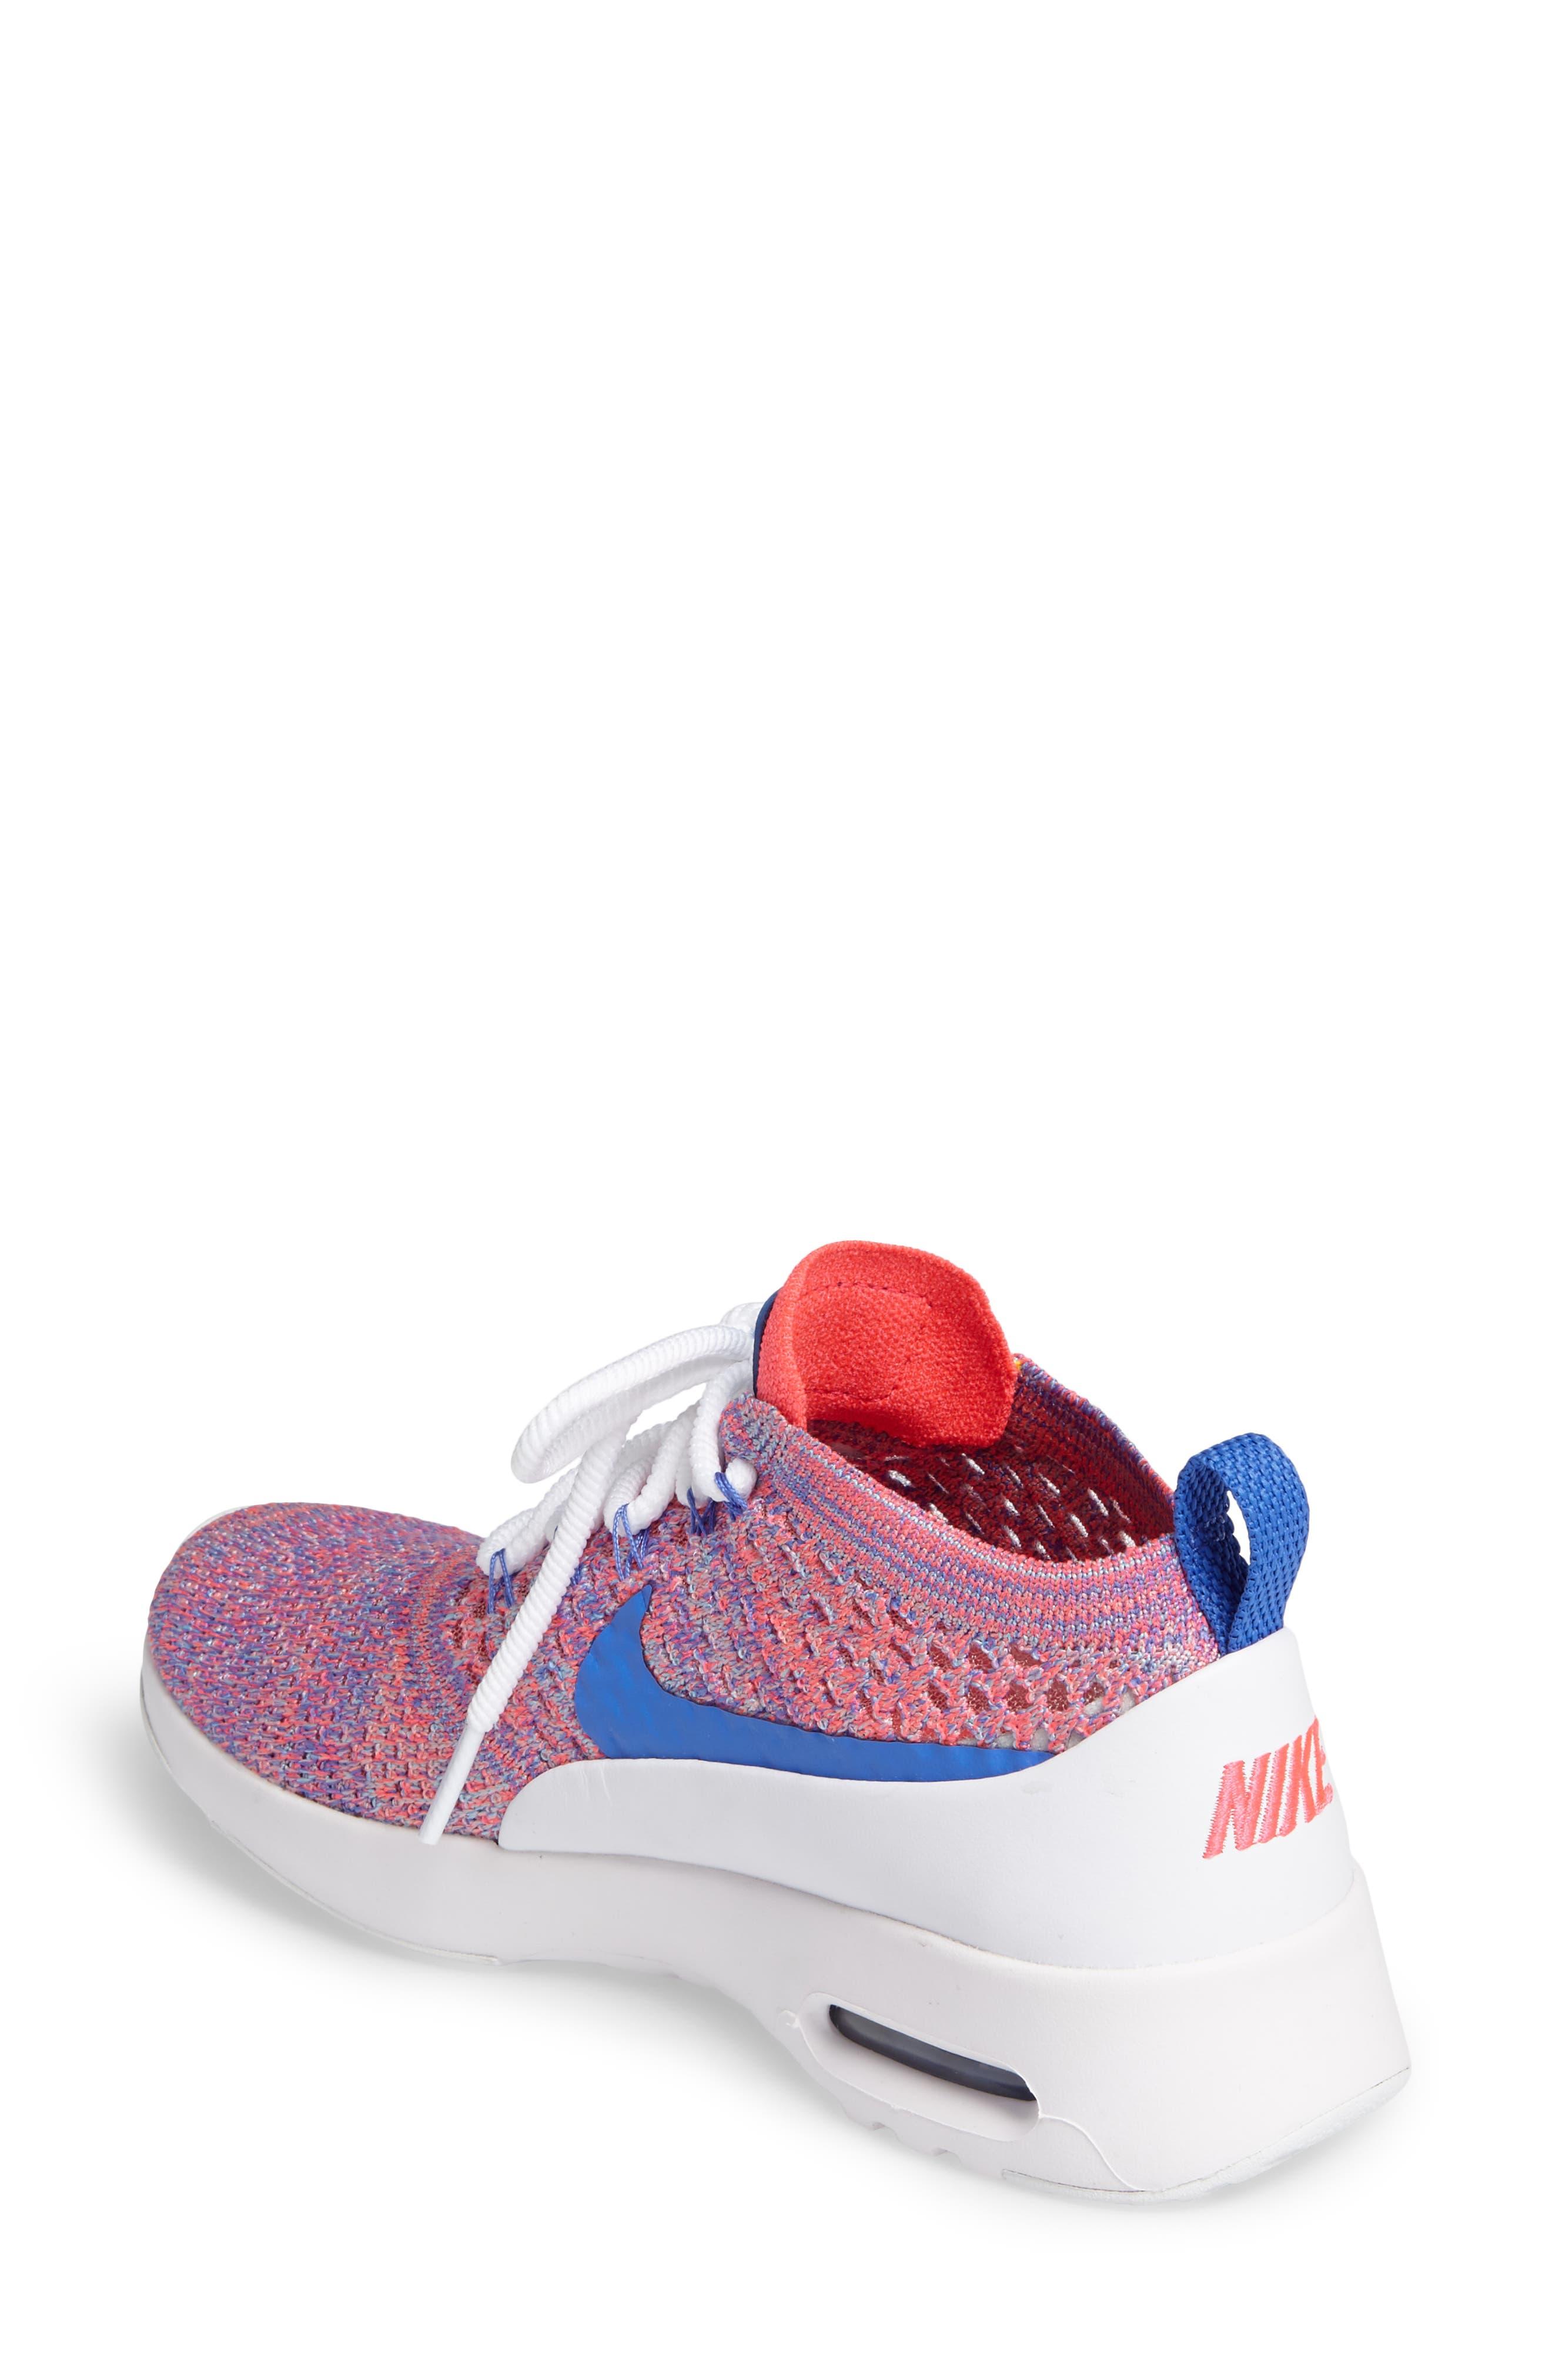 Alternate Image 2  - Nike Air Max Thea Ultra Flyknit Sneaker (Women)